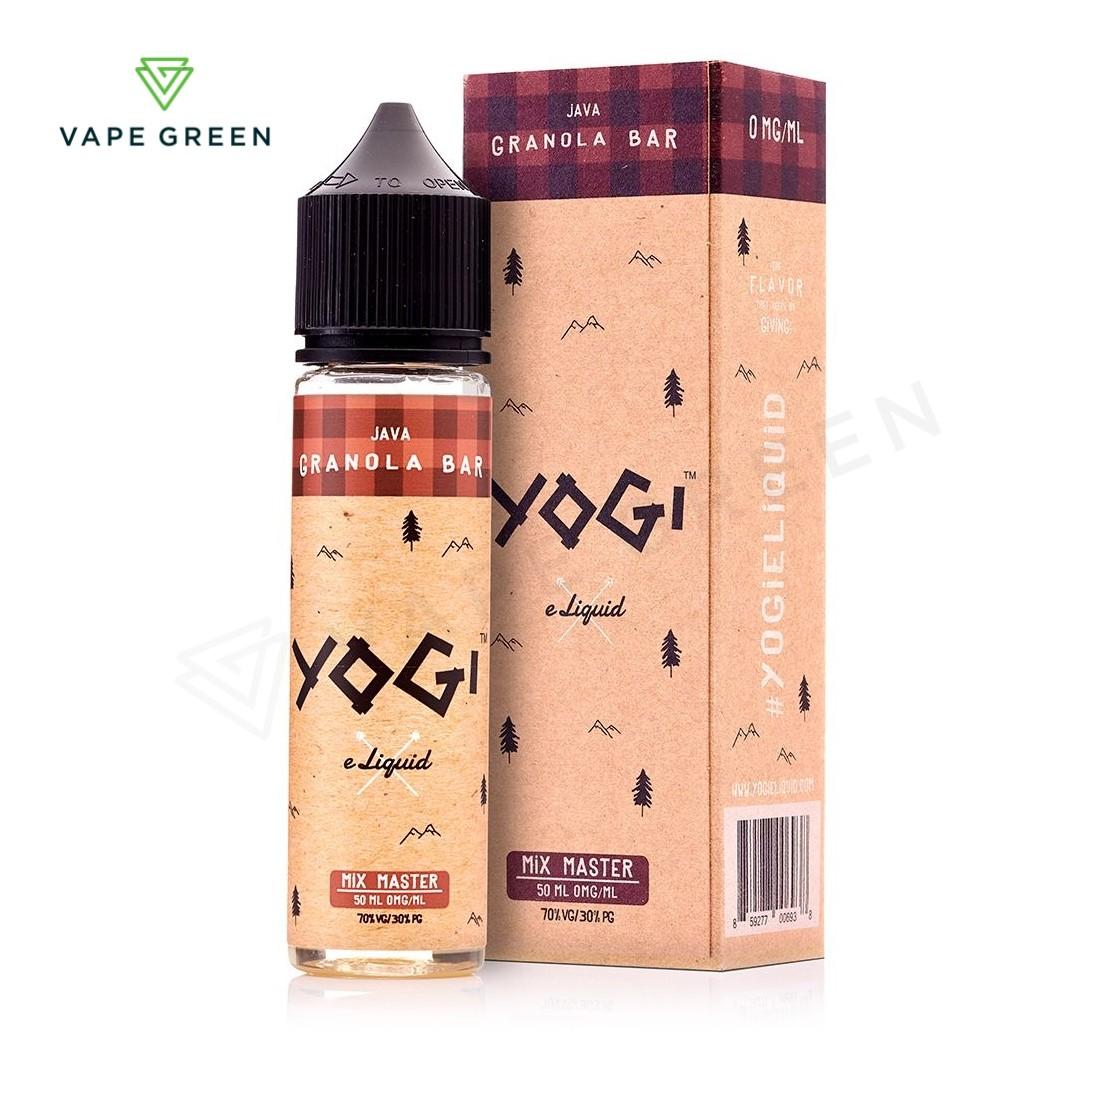 Java Granola Bar E-Liquid by Yogi 50ml